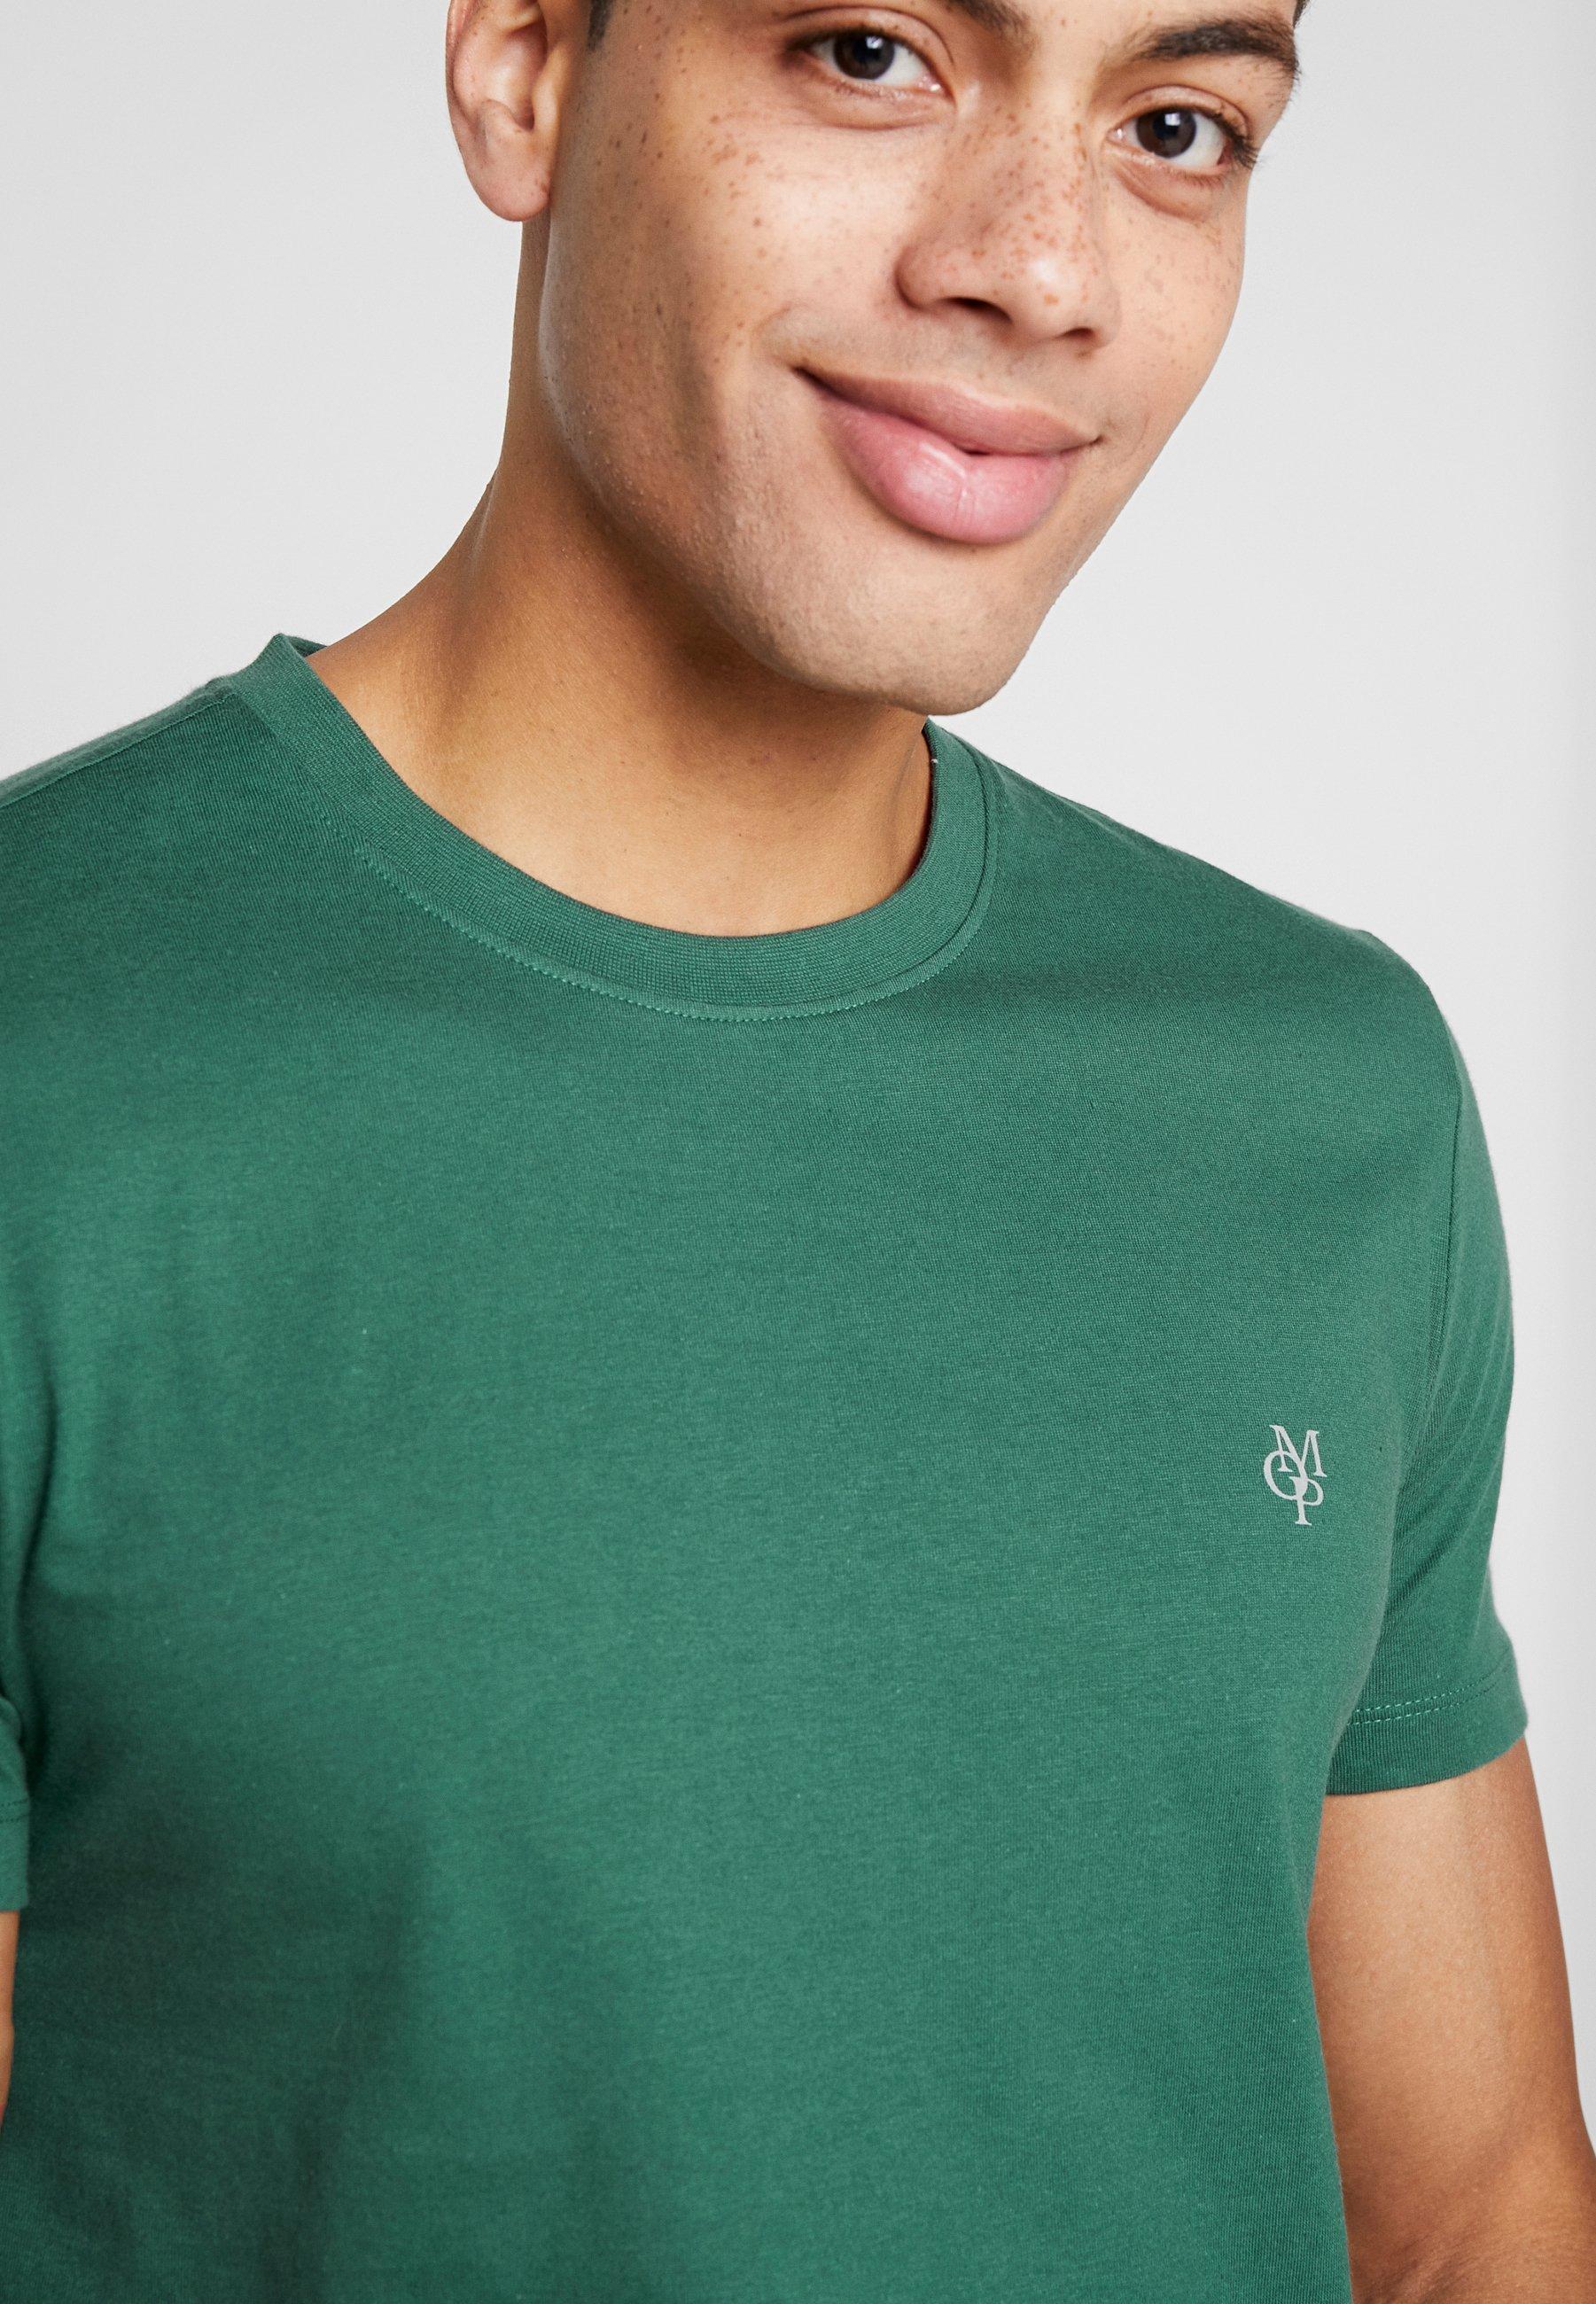 Marc O'Polo T-shirt basic - bistro green